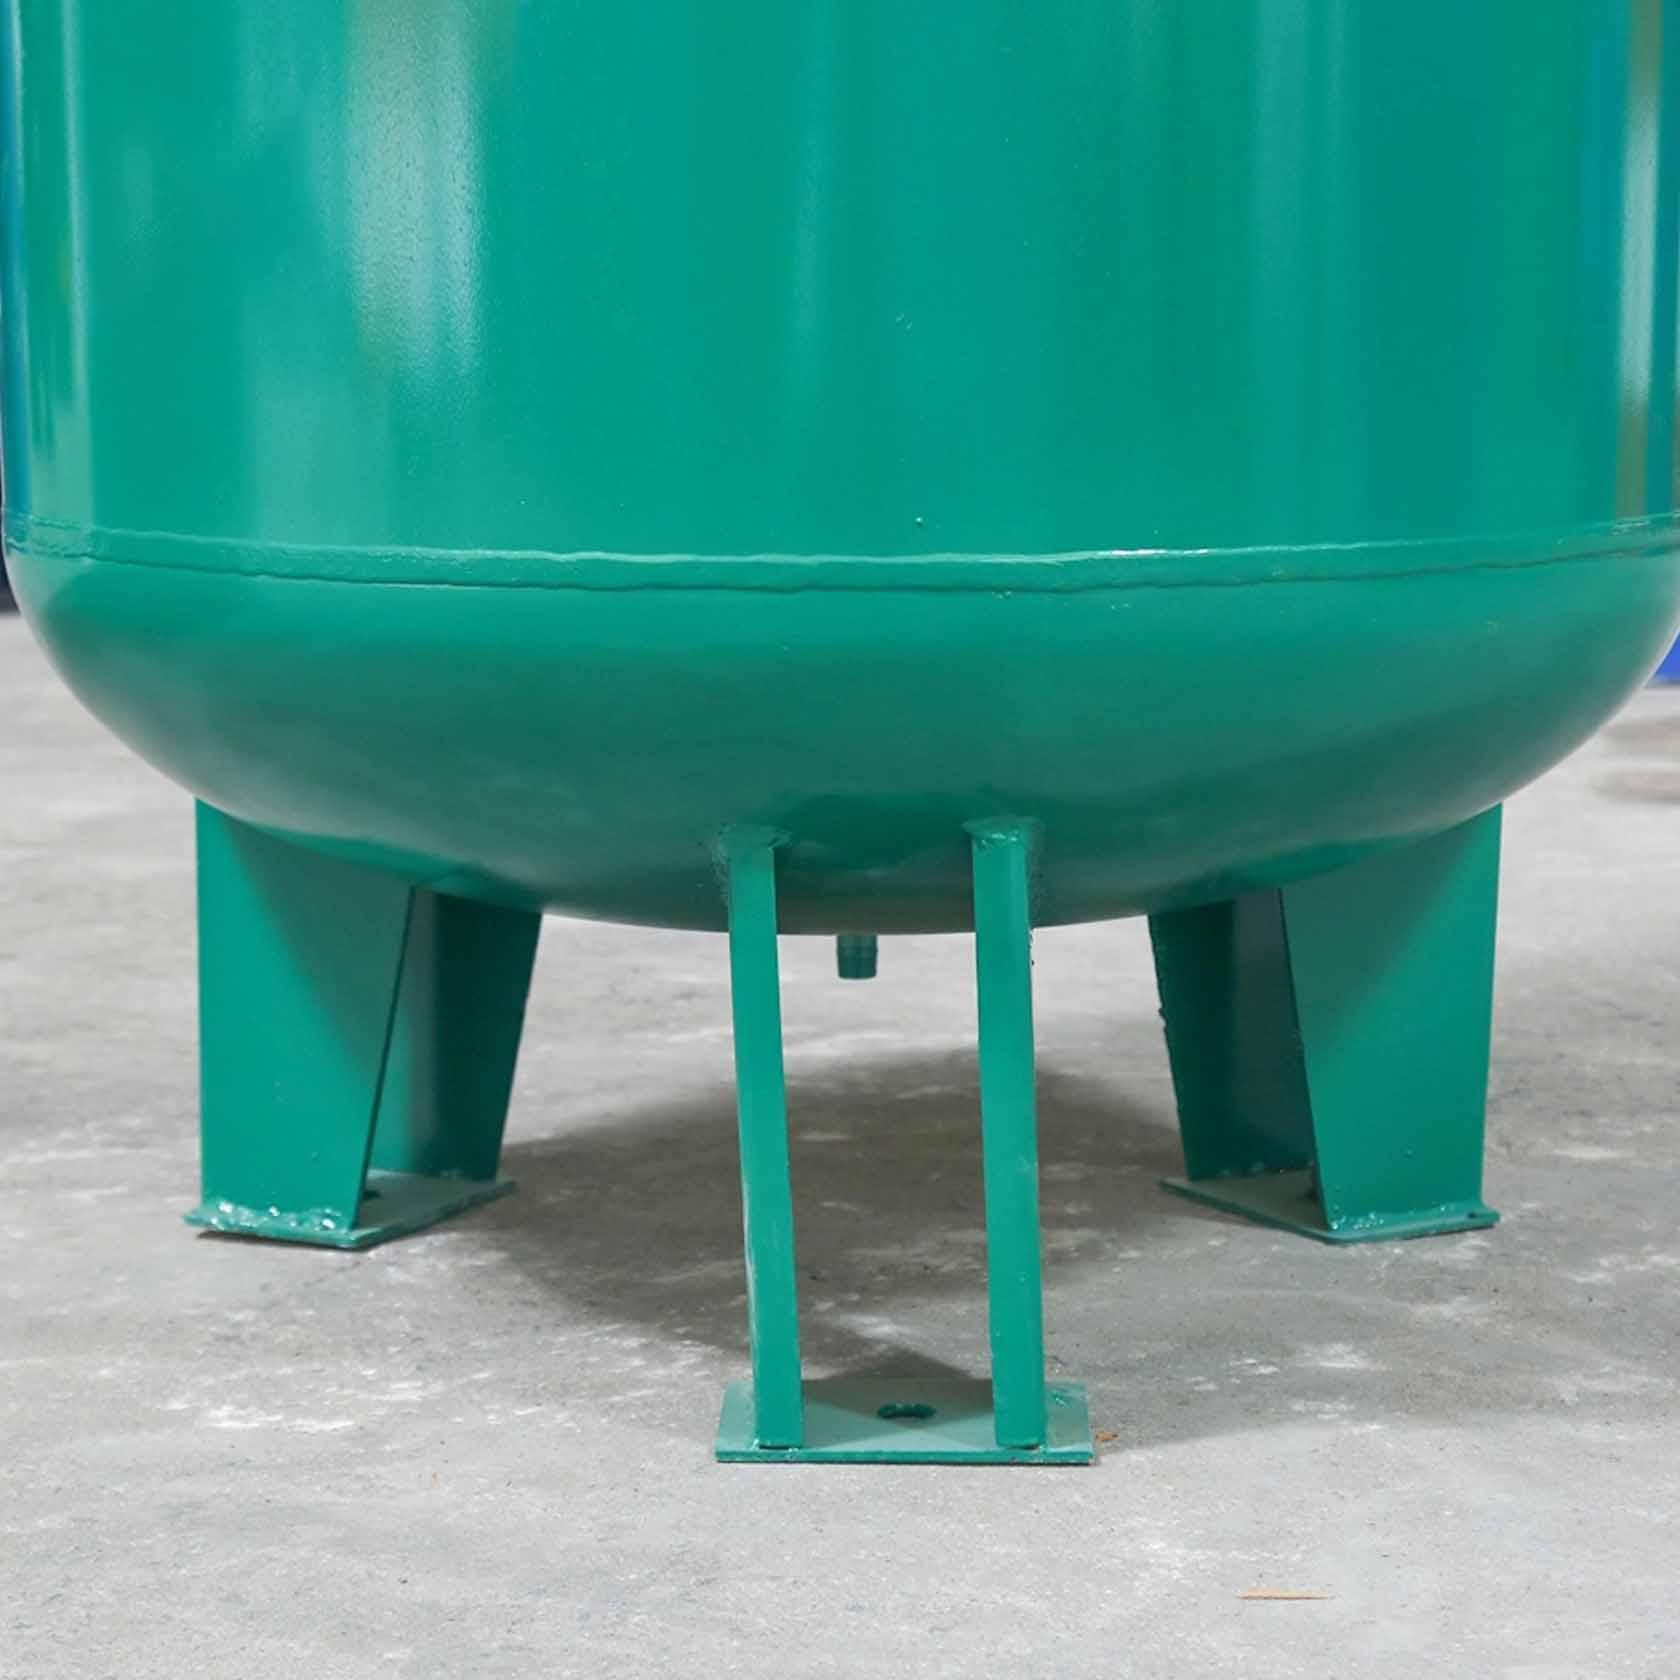 screw-compressor-air-tank